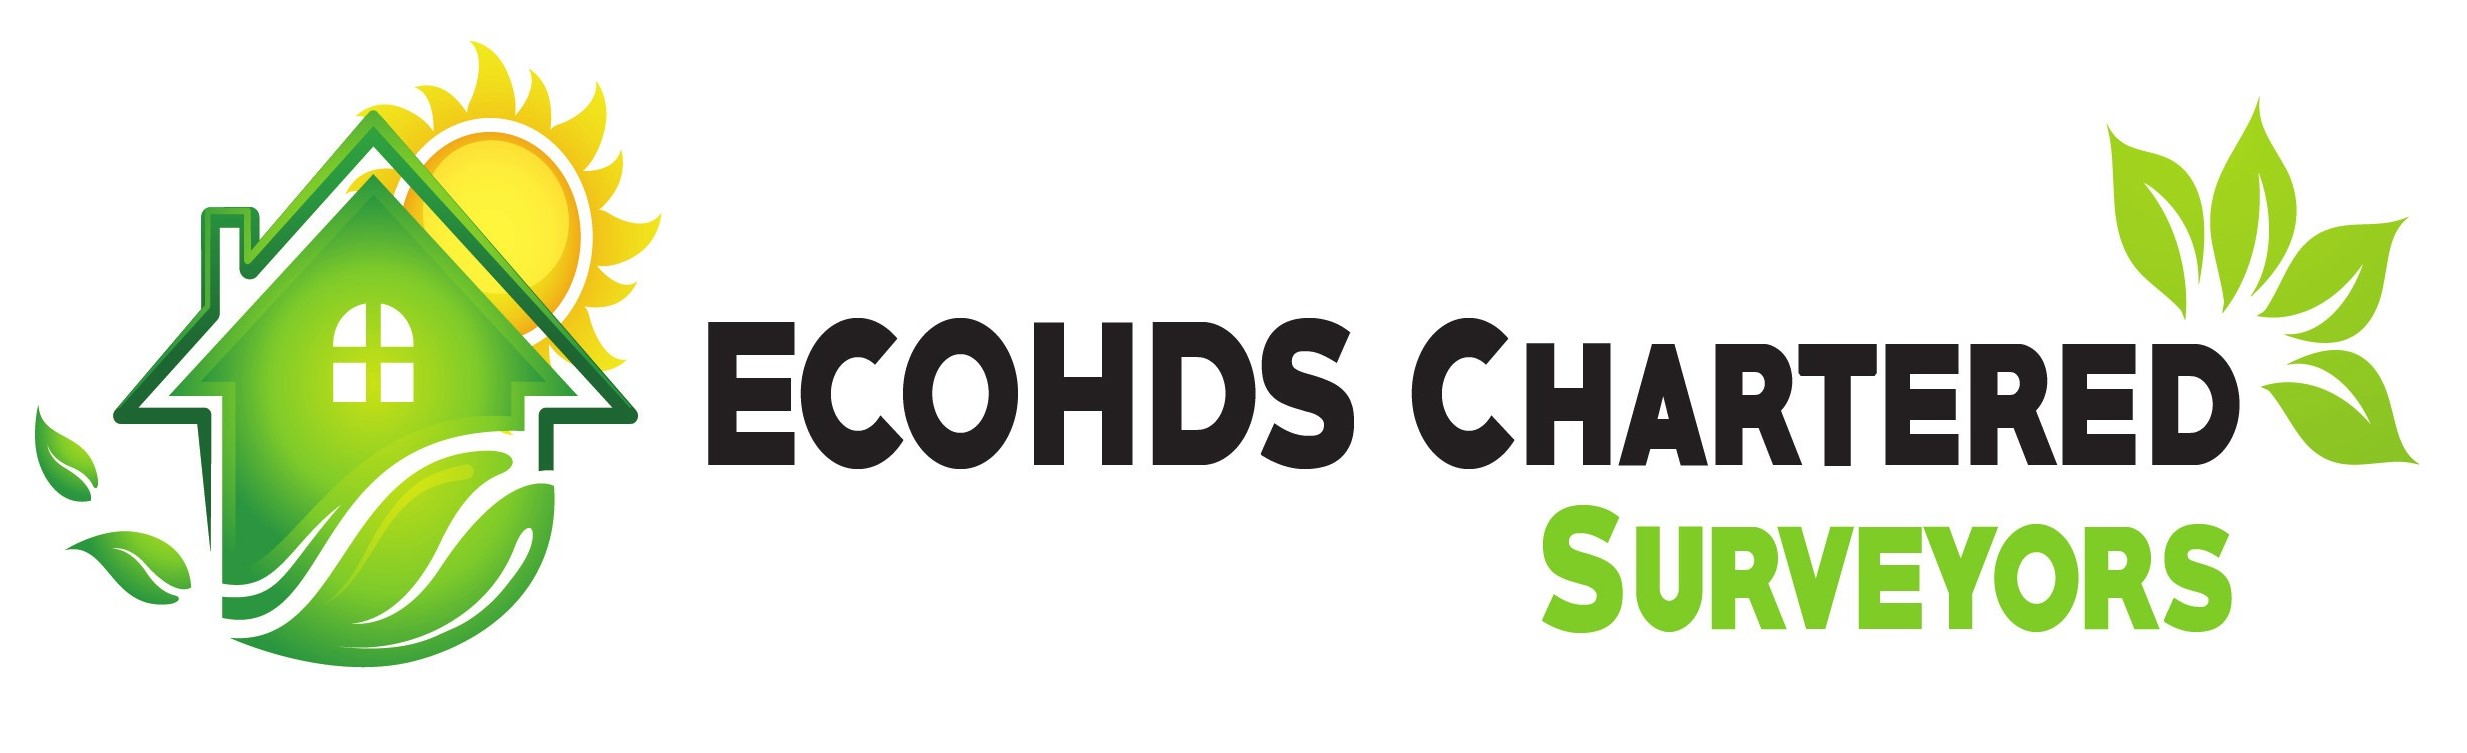 ECOHDS-Chartered-Surveyors